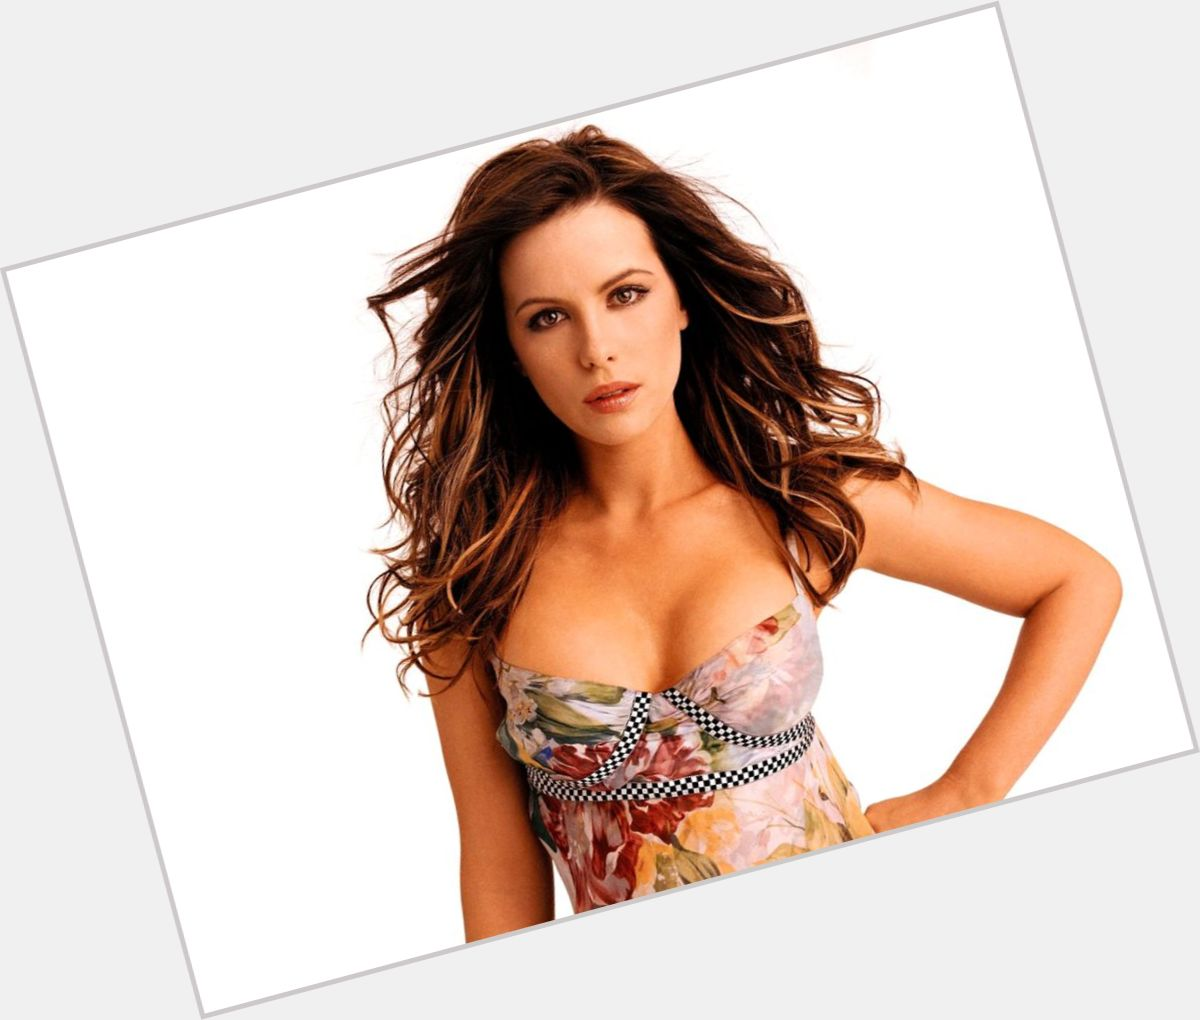 A very gorgeous woman 10